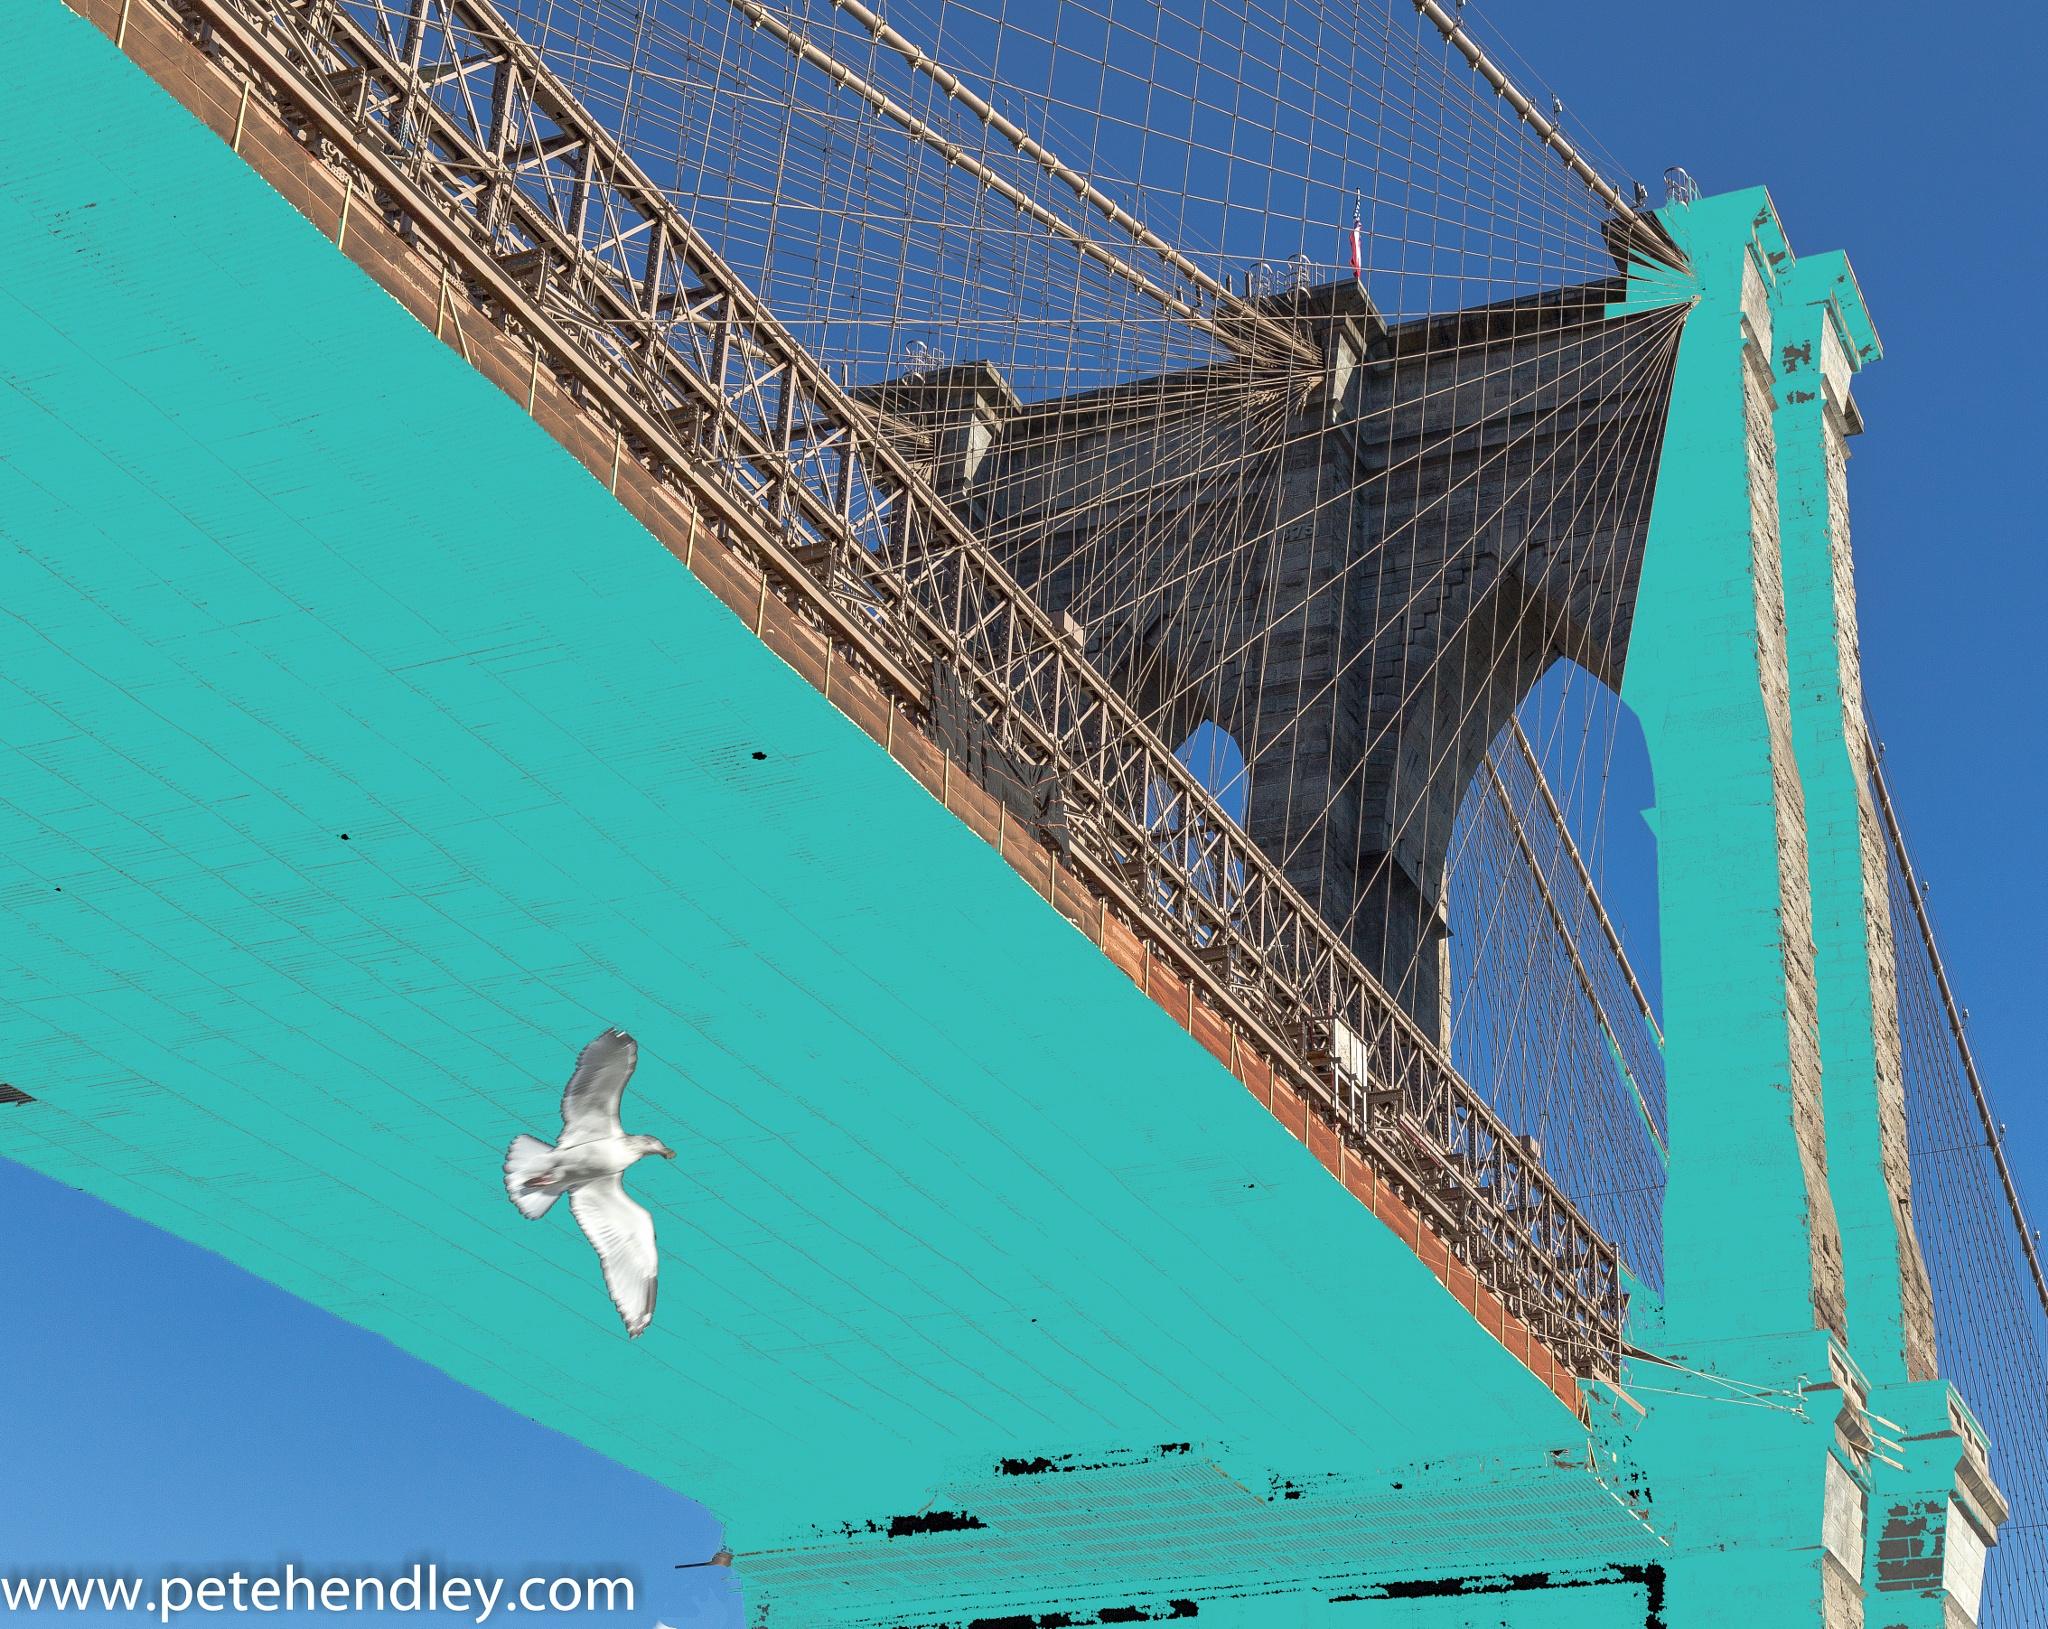 Brooklyn Bridge by Pete Hendley Photography